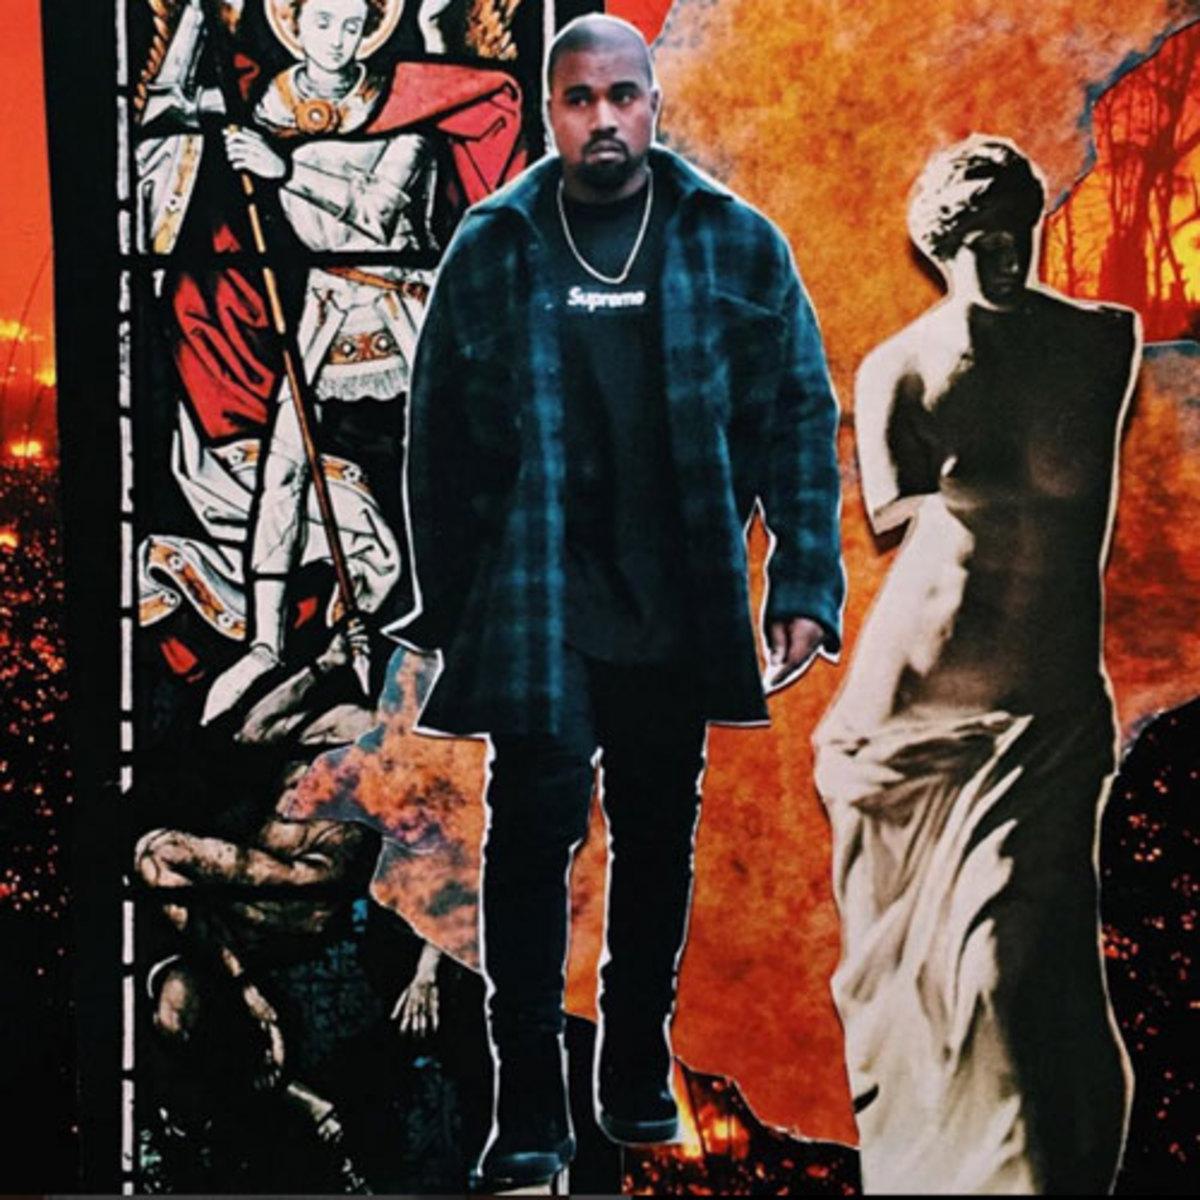 Hip hops best worst album namers djbooth album namers updateg malvernweather Images